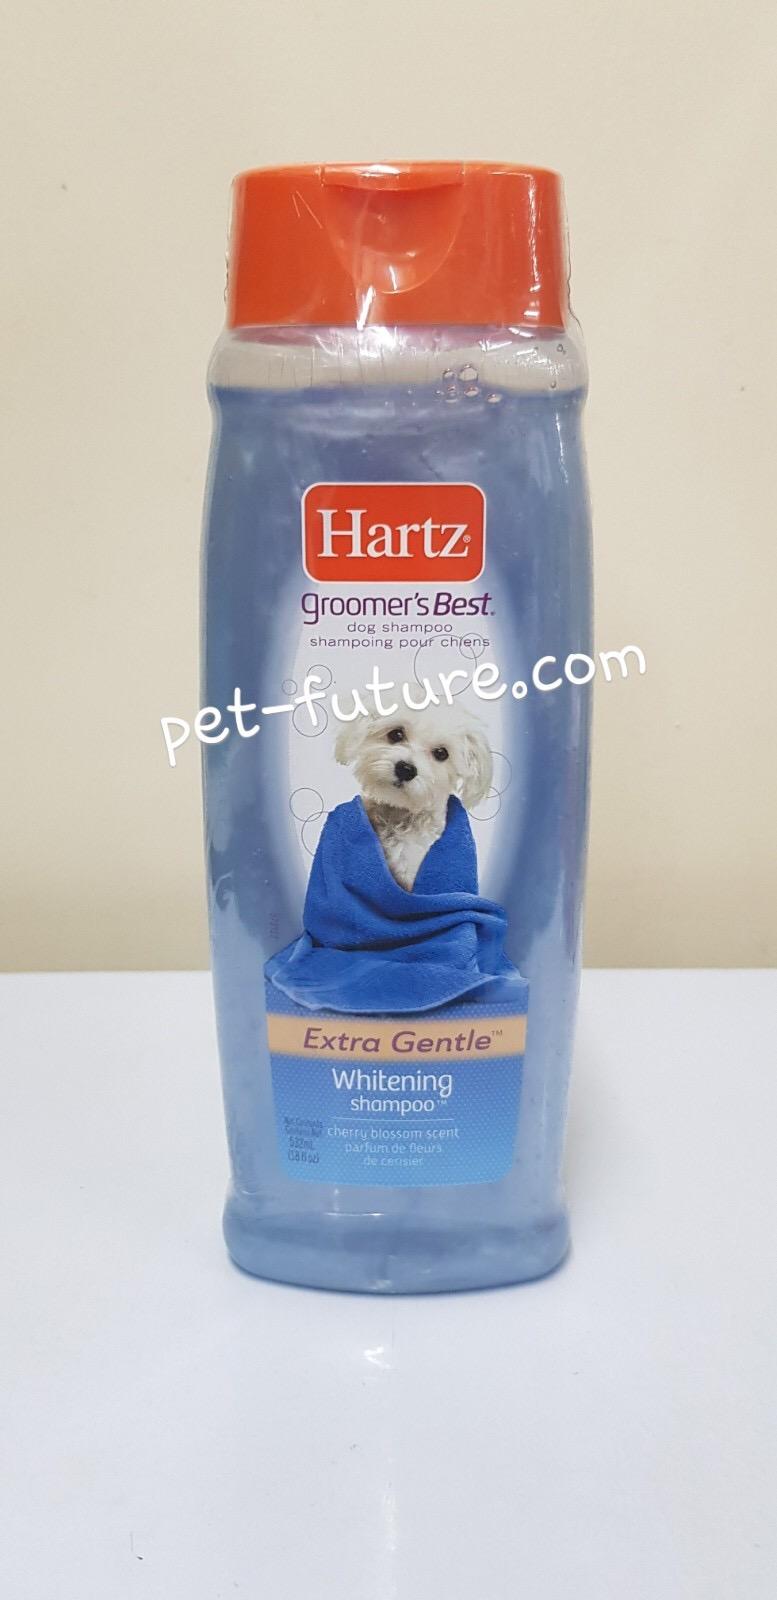 Hartz Whiten blanchissant แชมพูสูตรพิเศษ สำหรับสุนัขขนสีขาว และขนสีอ่อนทุกสายพันธ์ กลิ่น Cherry Blossom